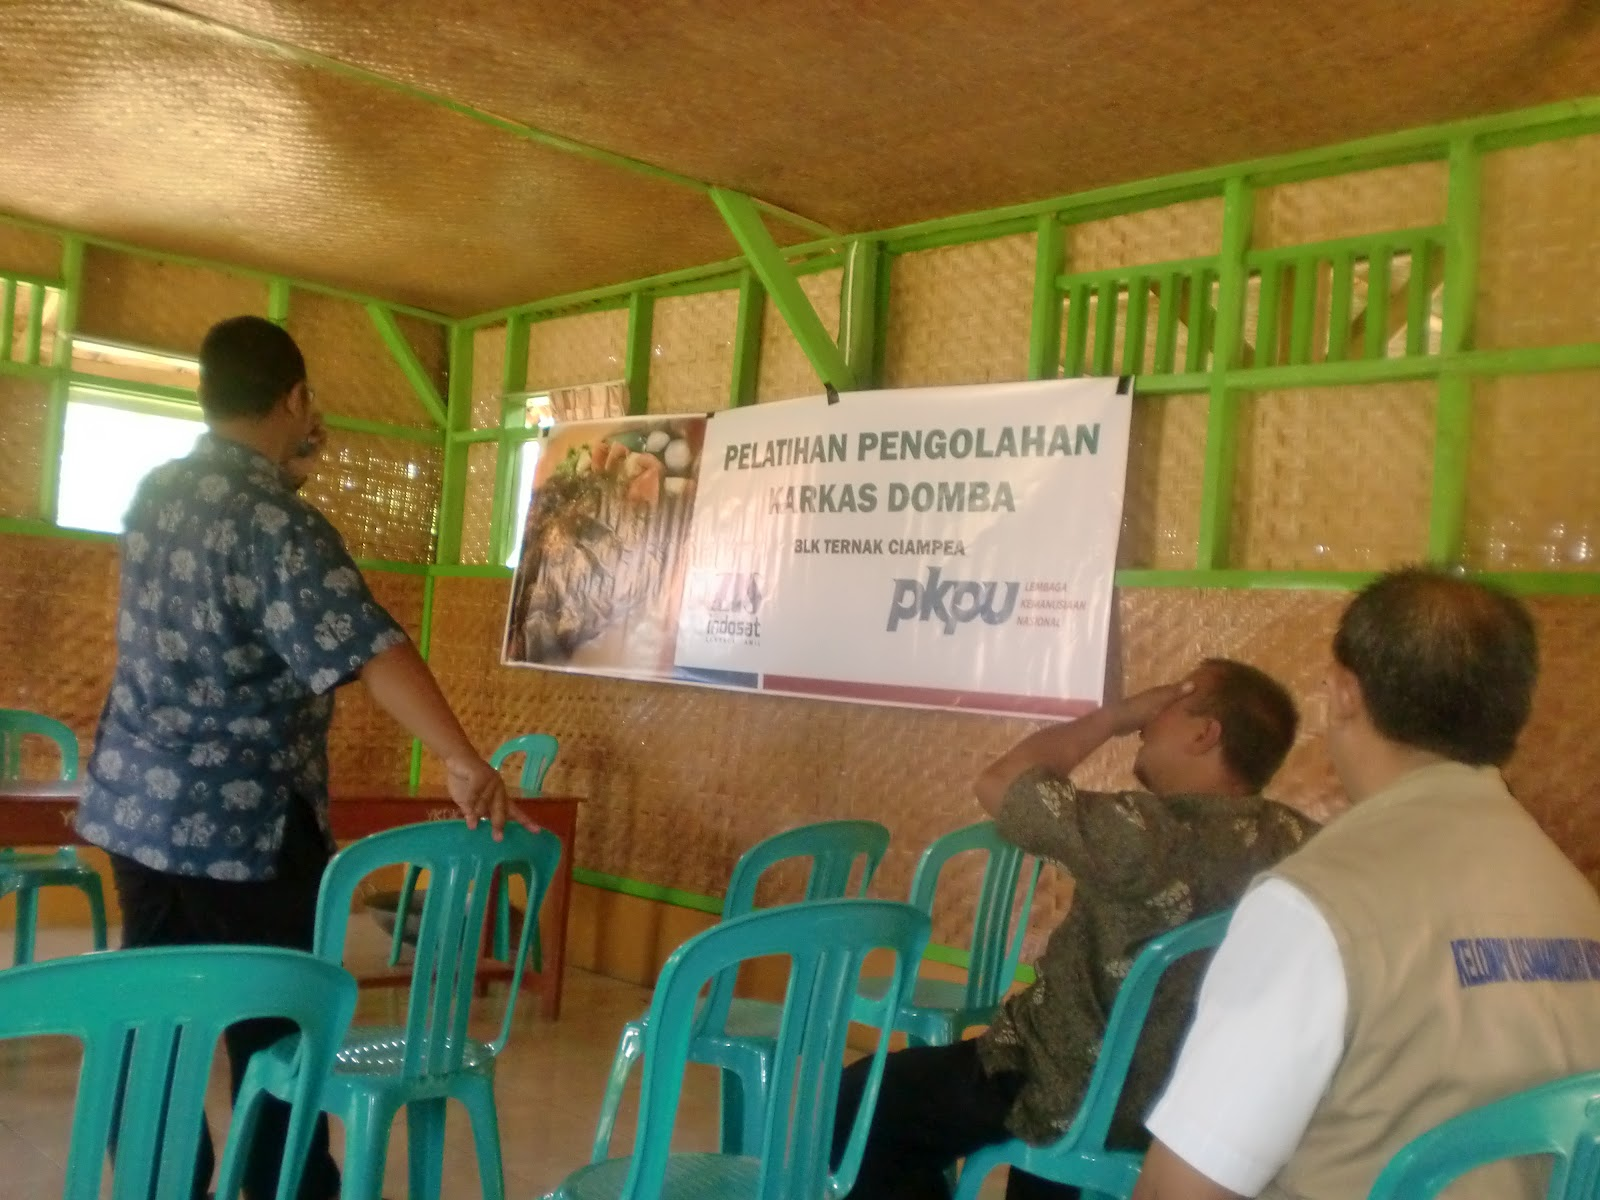 Pelatihan Pengolahan Karkas Domba di MT Farm, Ciampea, Bogor